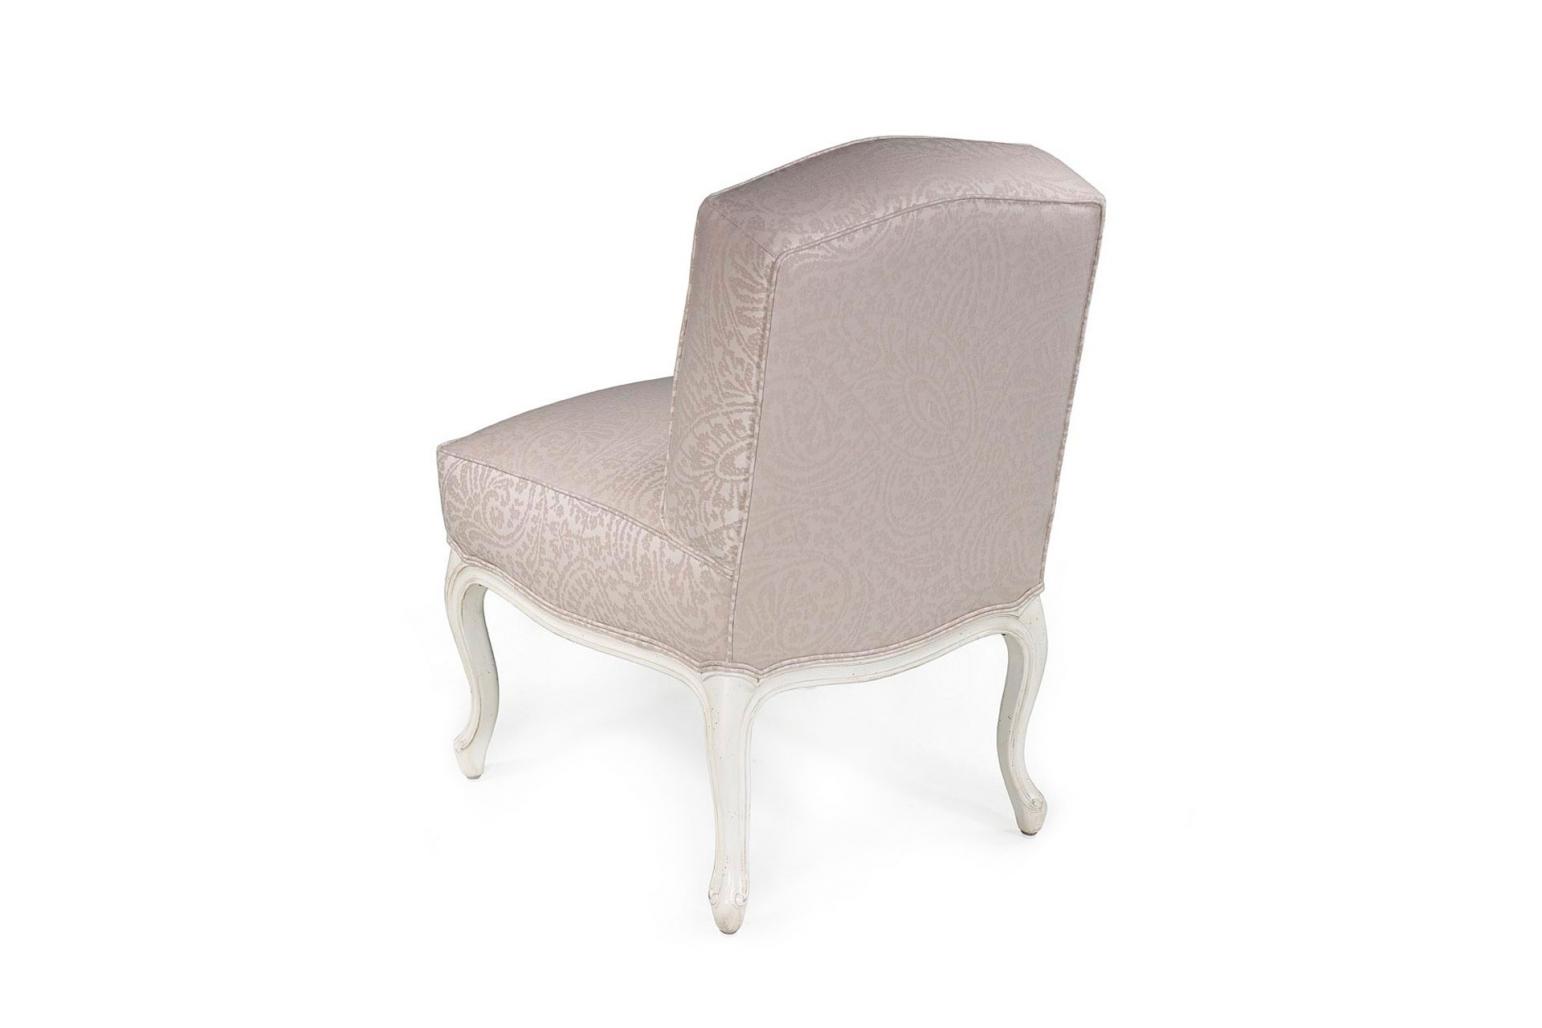 Louis Xv Desk Chairs Sybil Desk Chairs